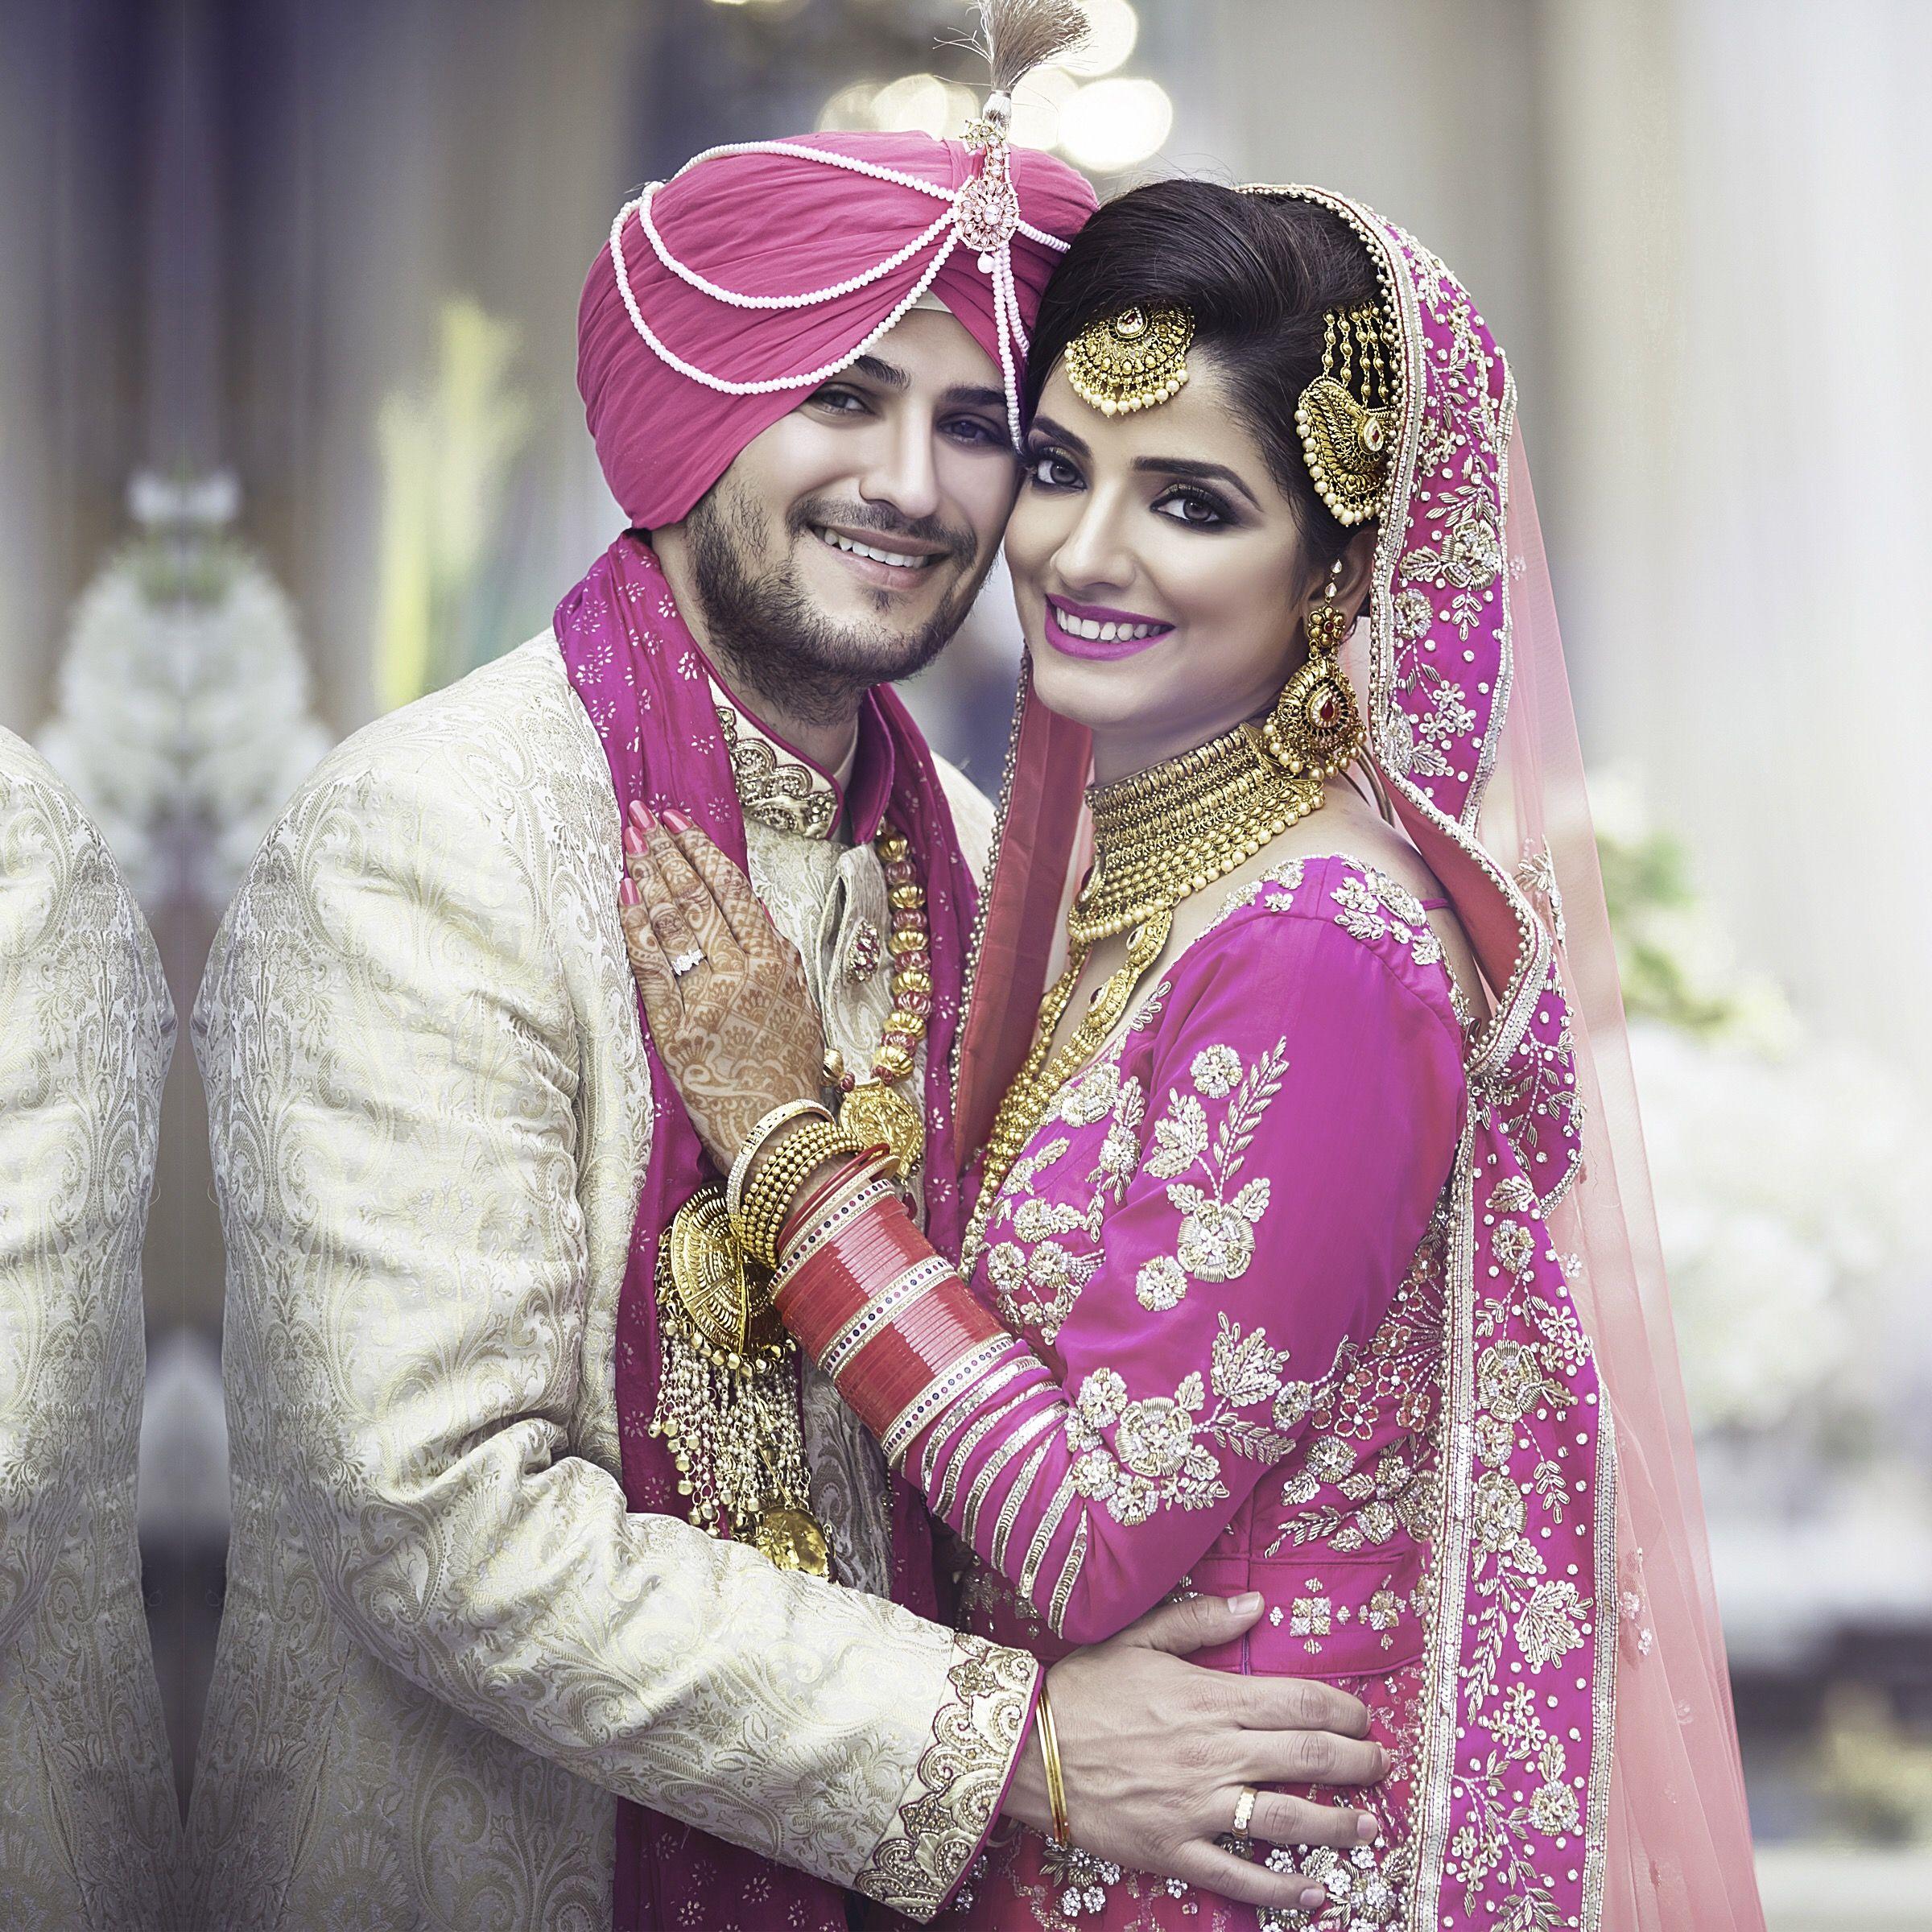 Sadhana Indian Wedding Photography Couples Indian Wedding Photography Poses Indian Wedding Couple